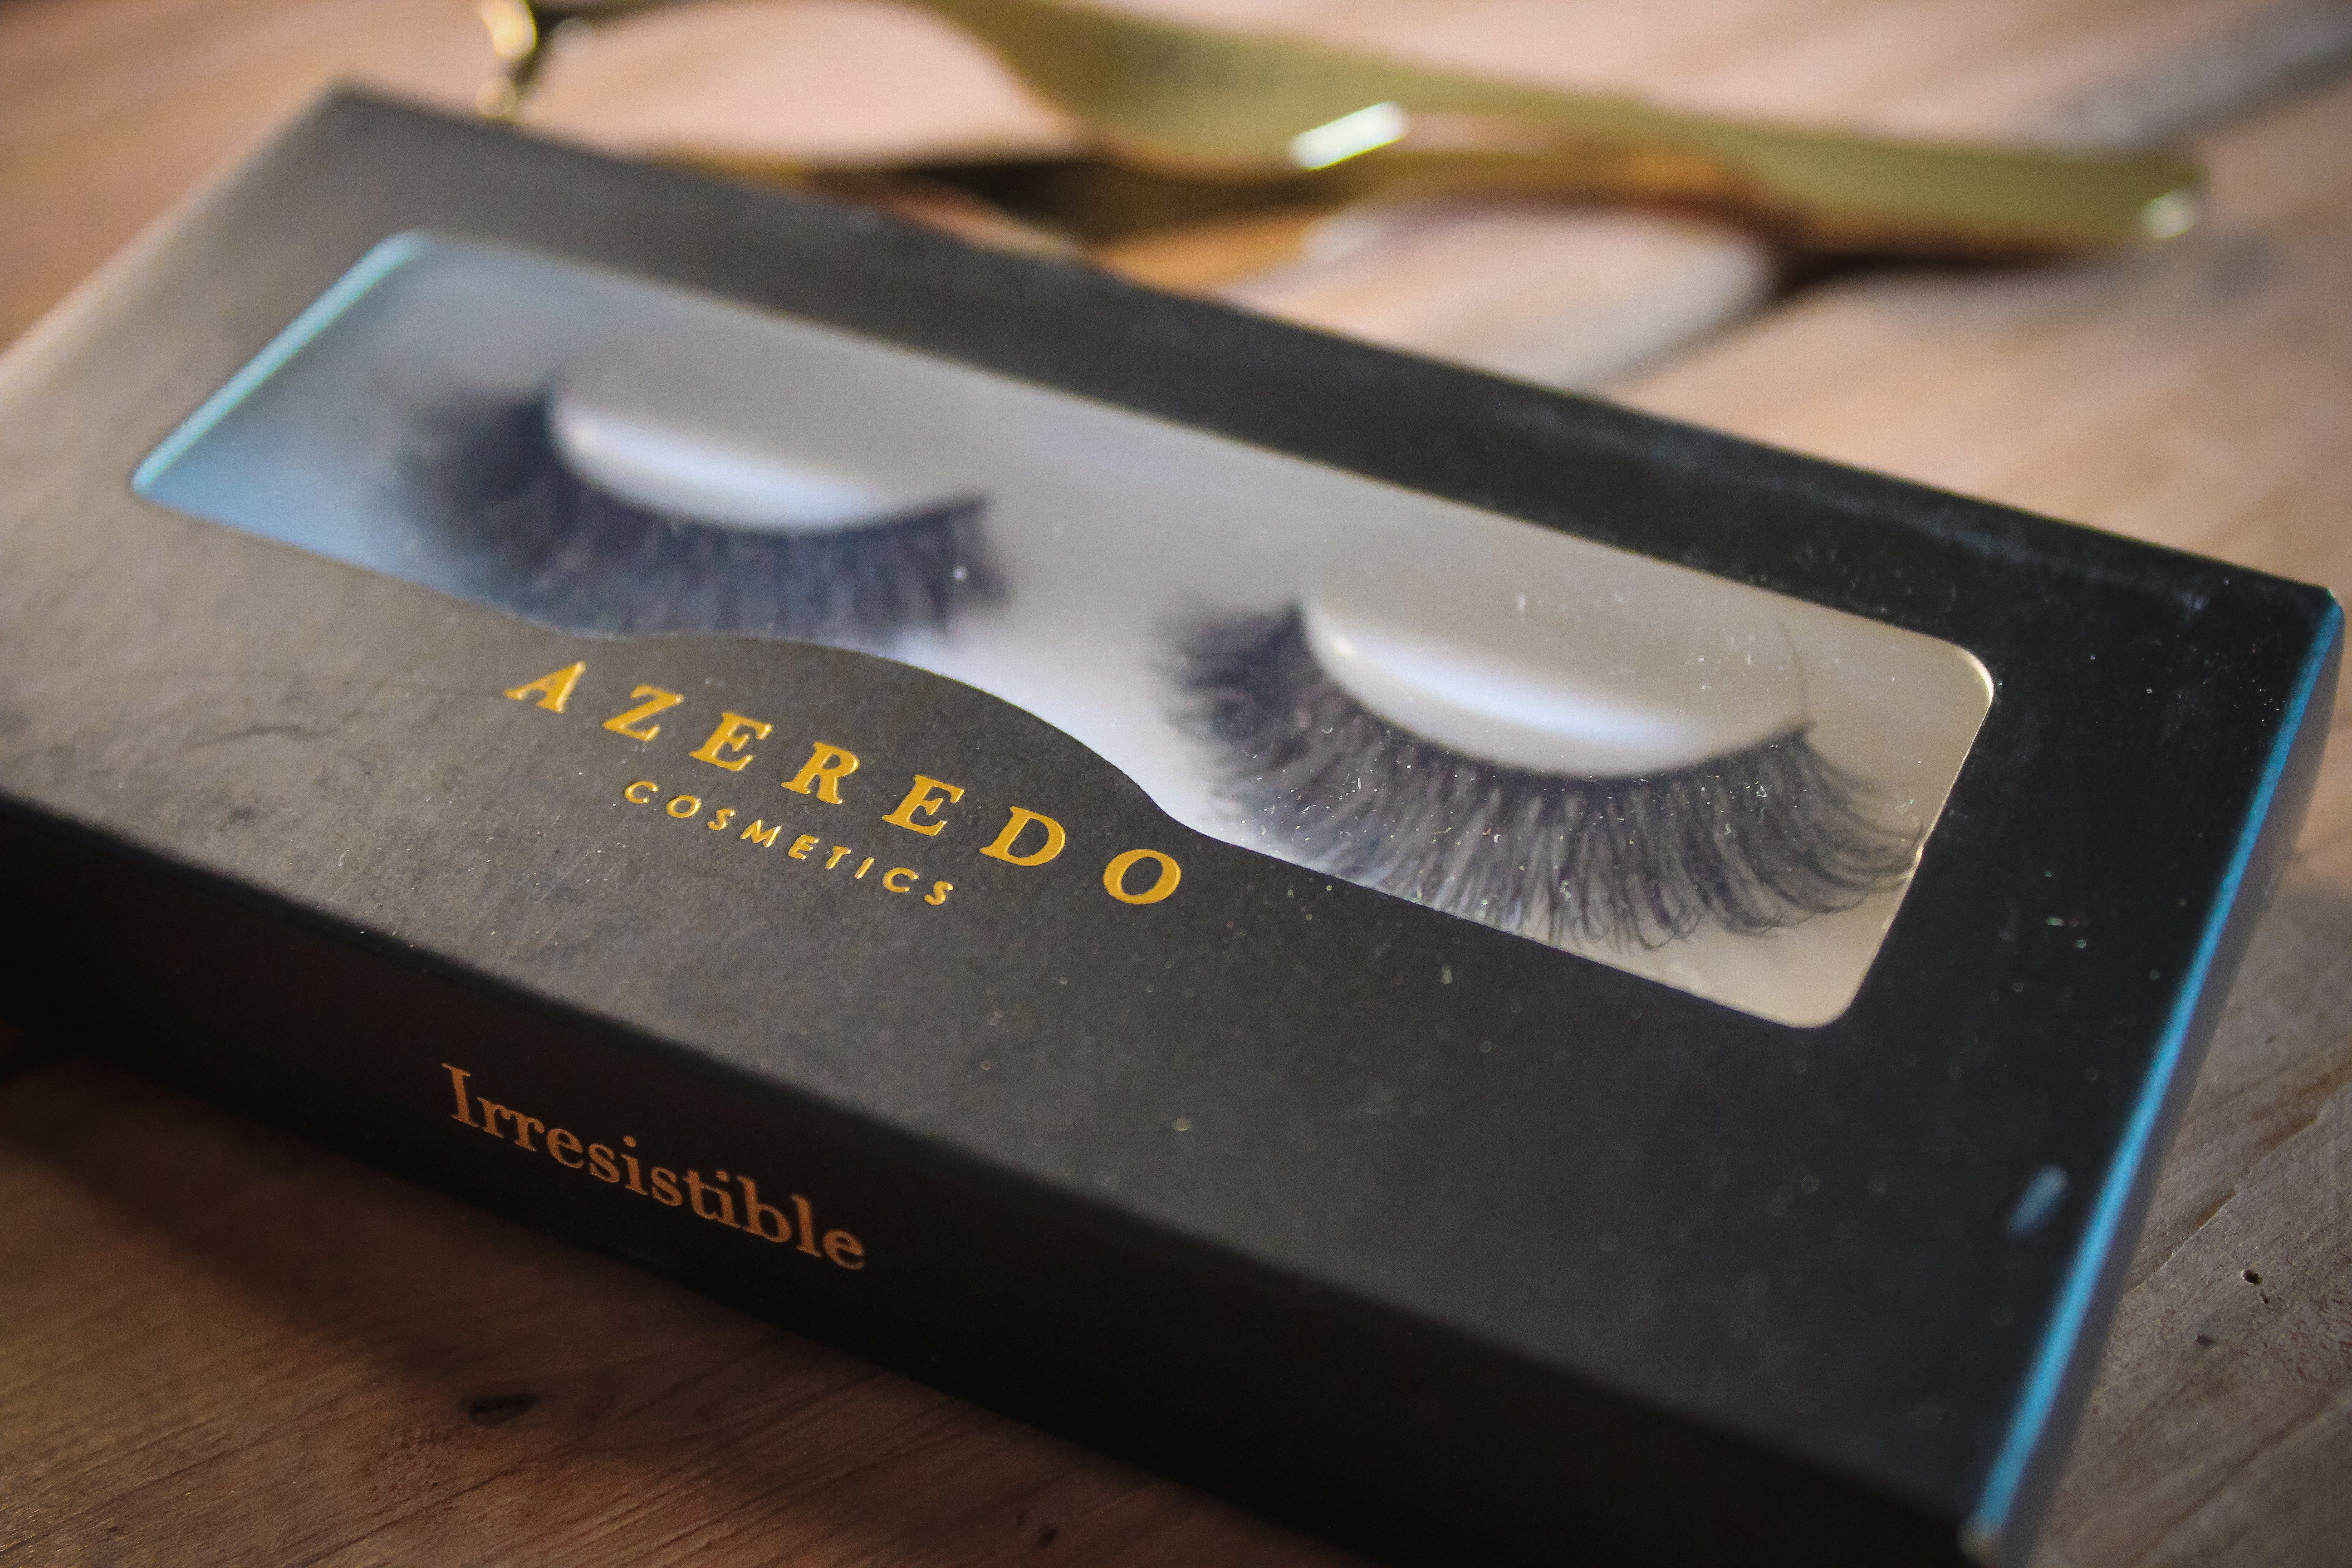 Azeredo Cosmetics False Lashes in Irresistible Review